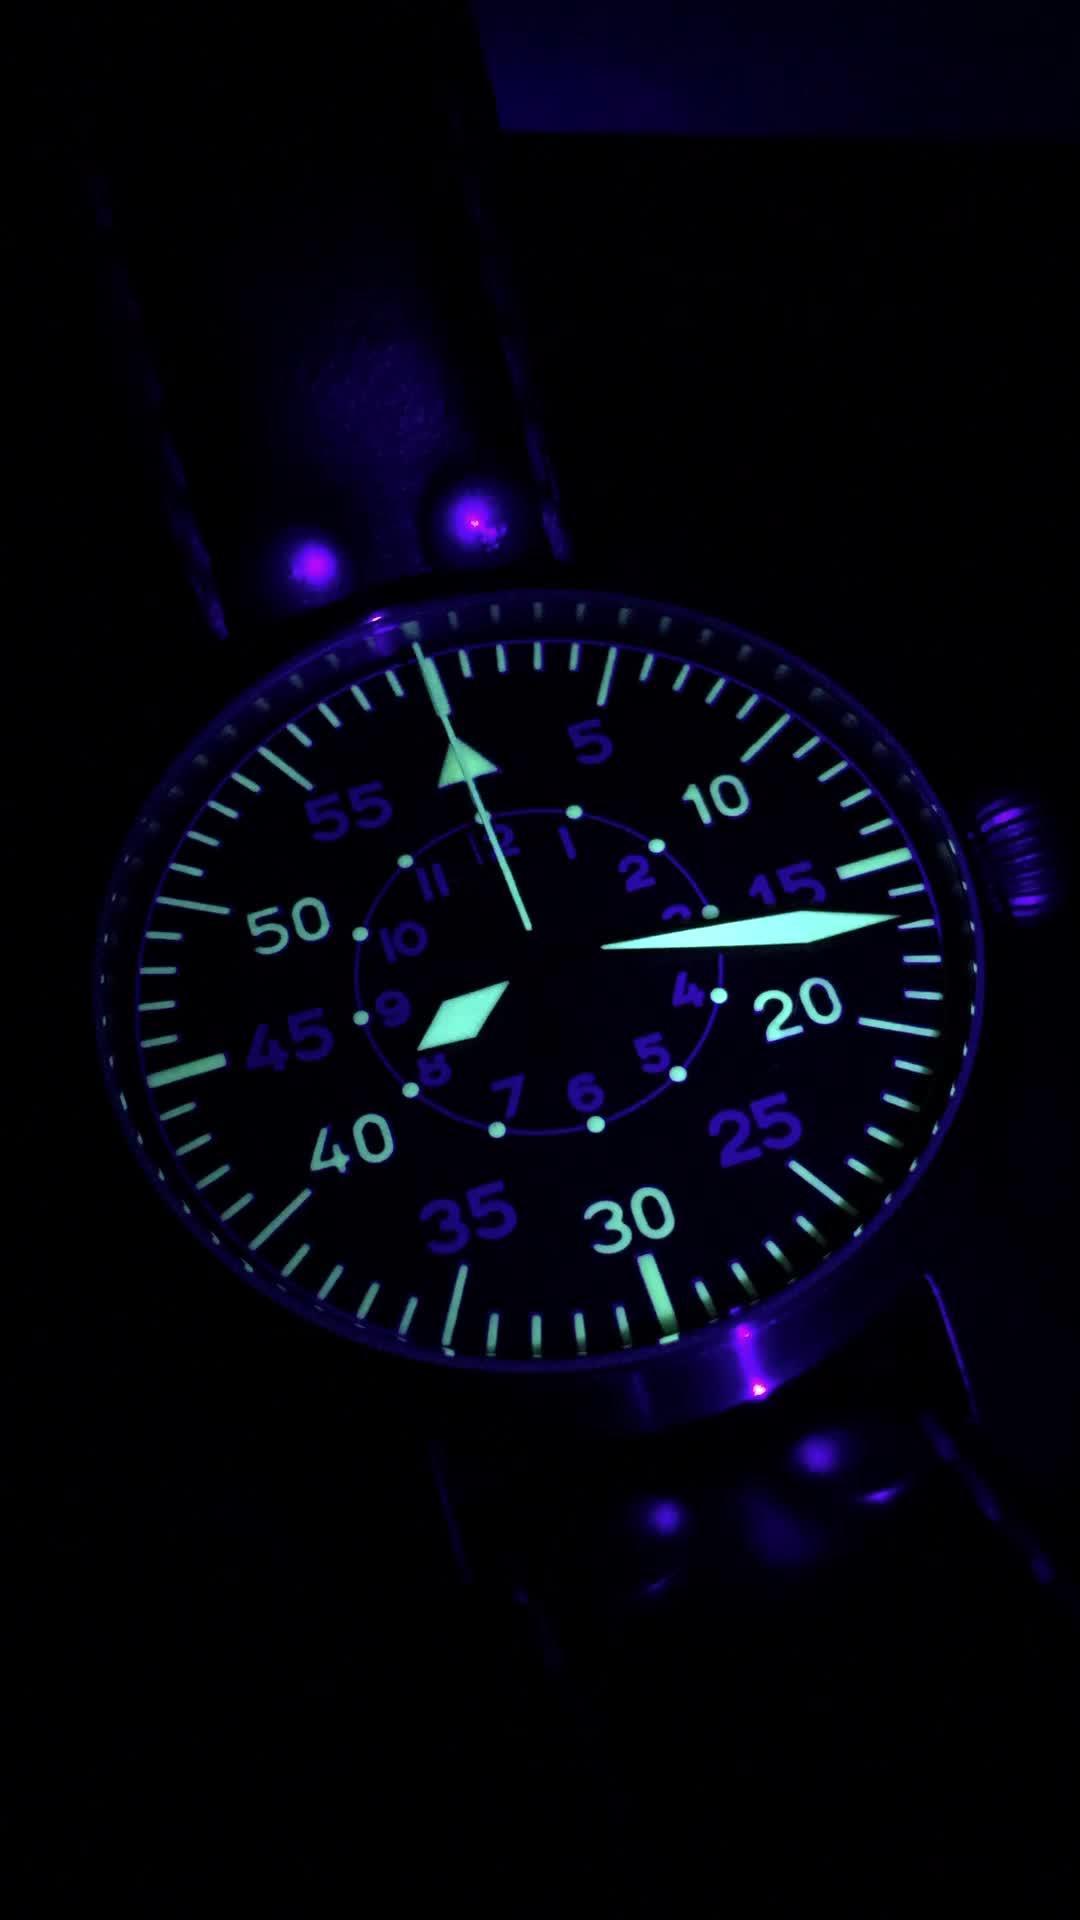 watches, [Stowa] Black light lume timelapse, looks like old-school radar display (reddit) GIFs